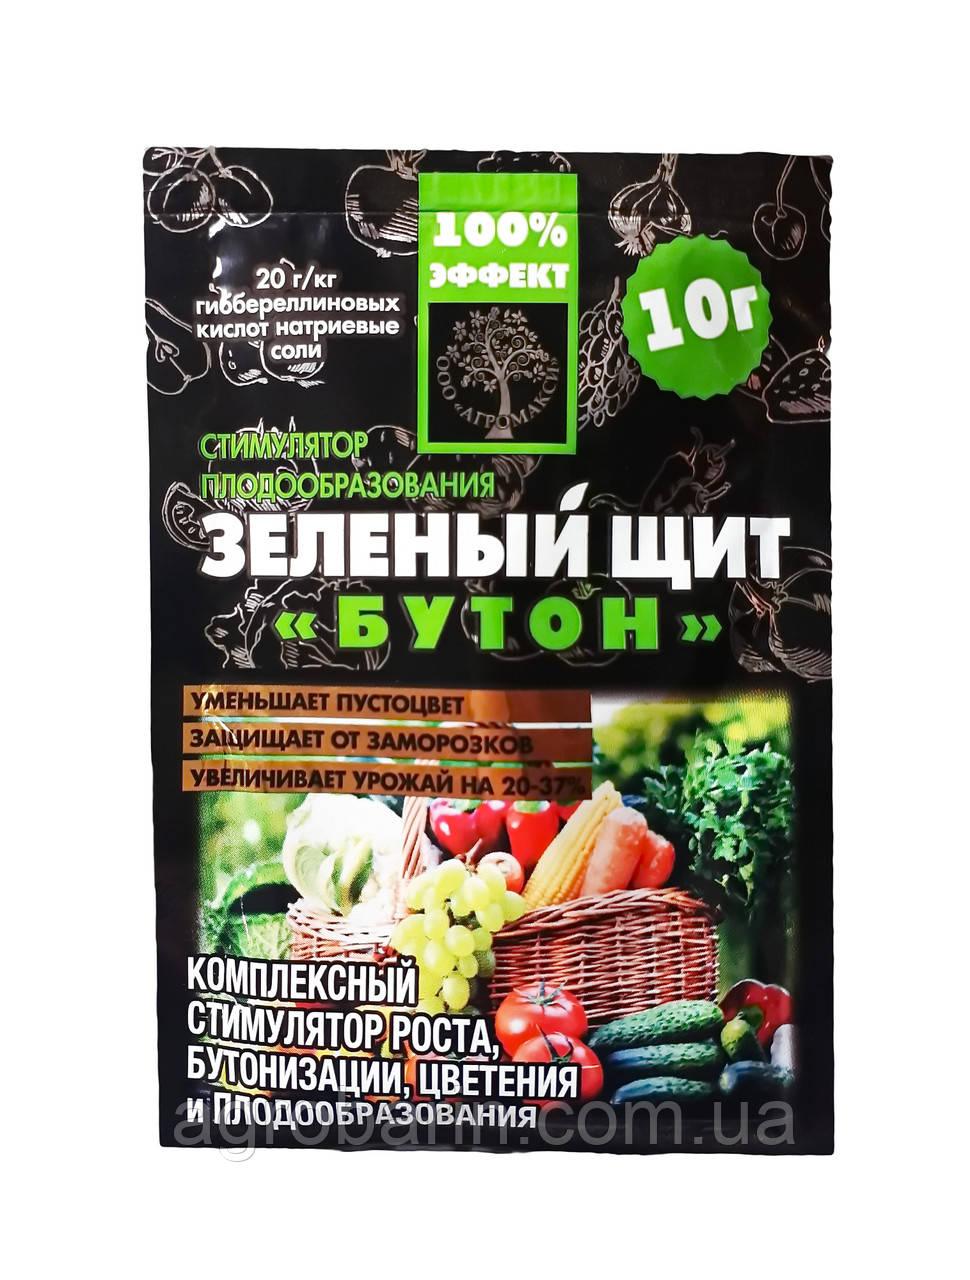 Бутон Зеленый Щит 10 гр,оригинал